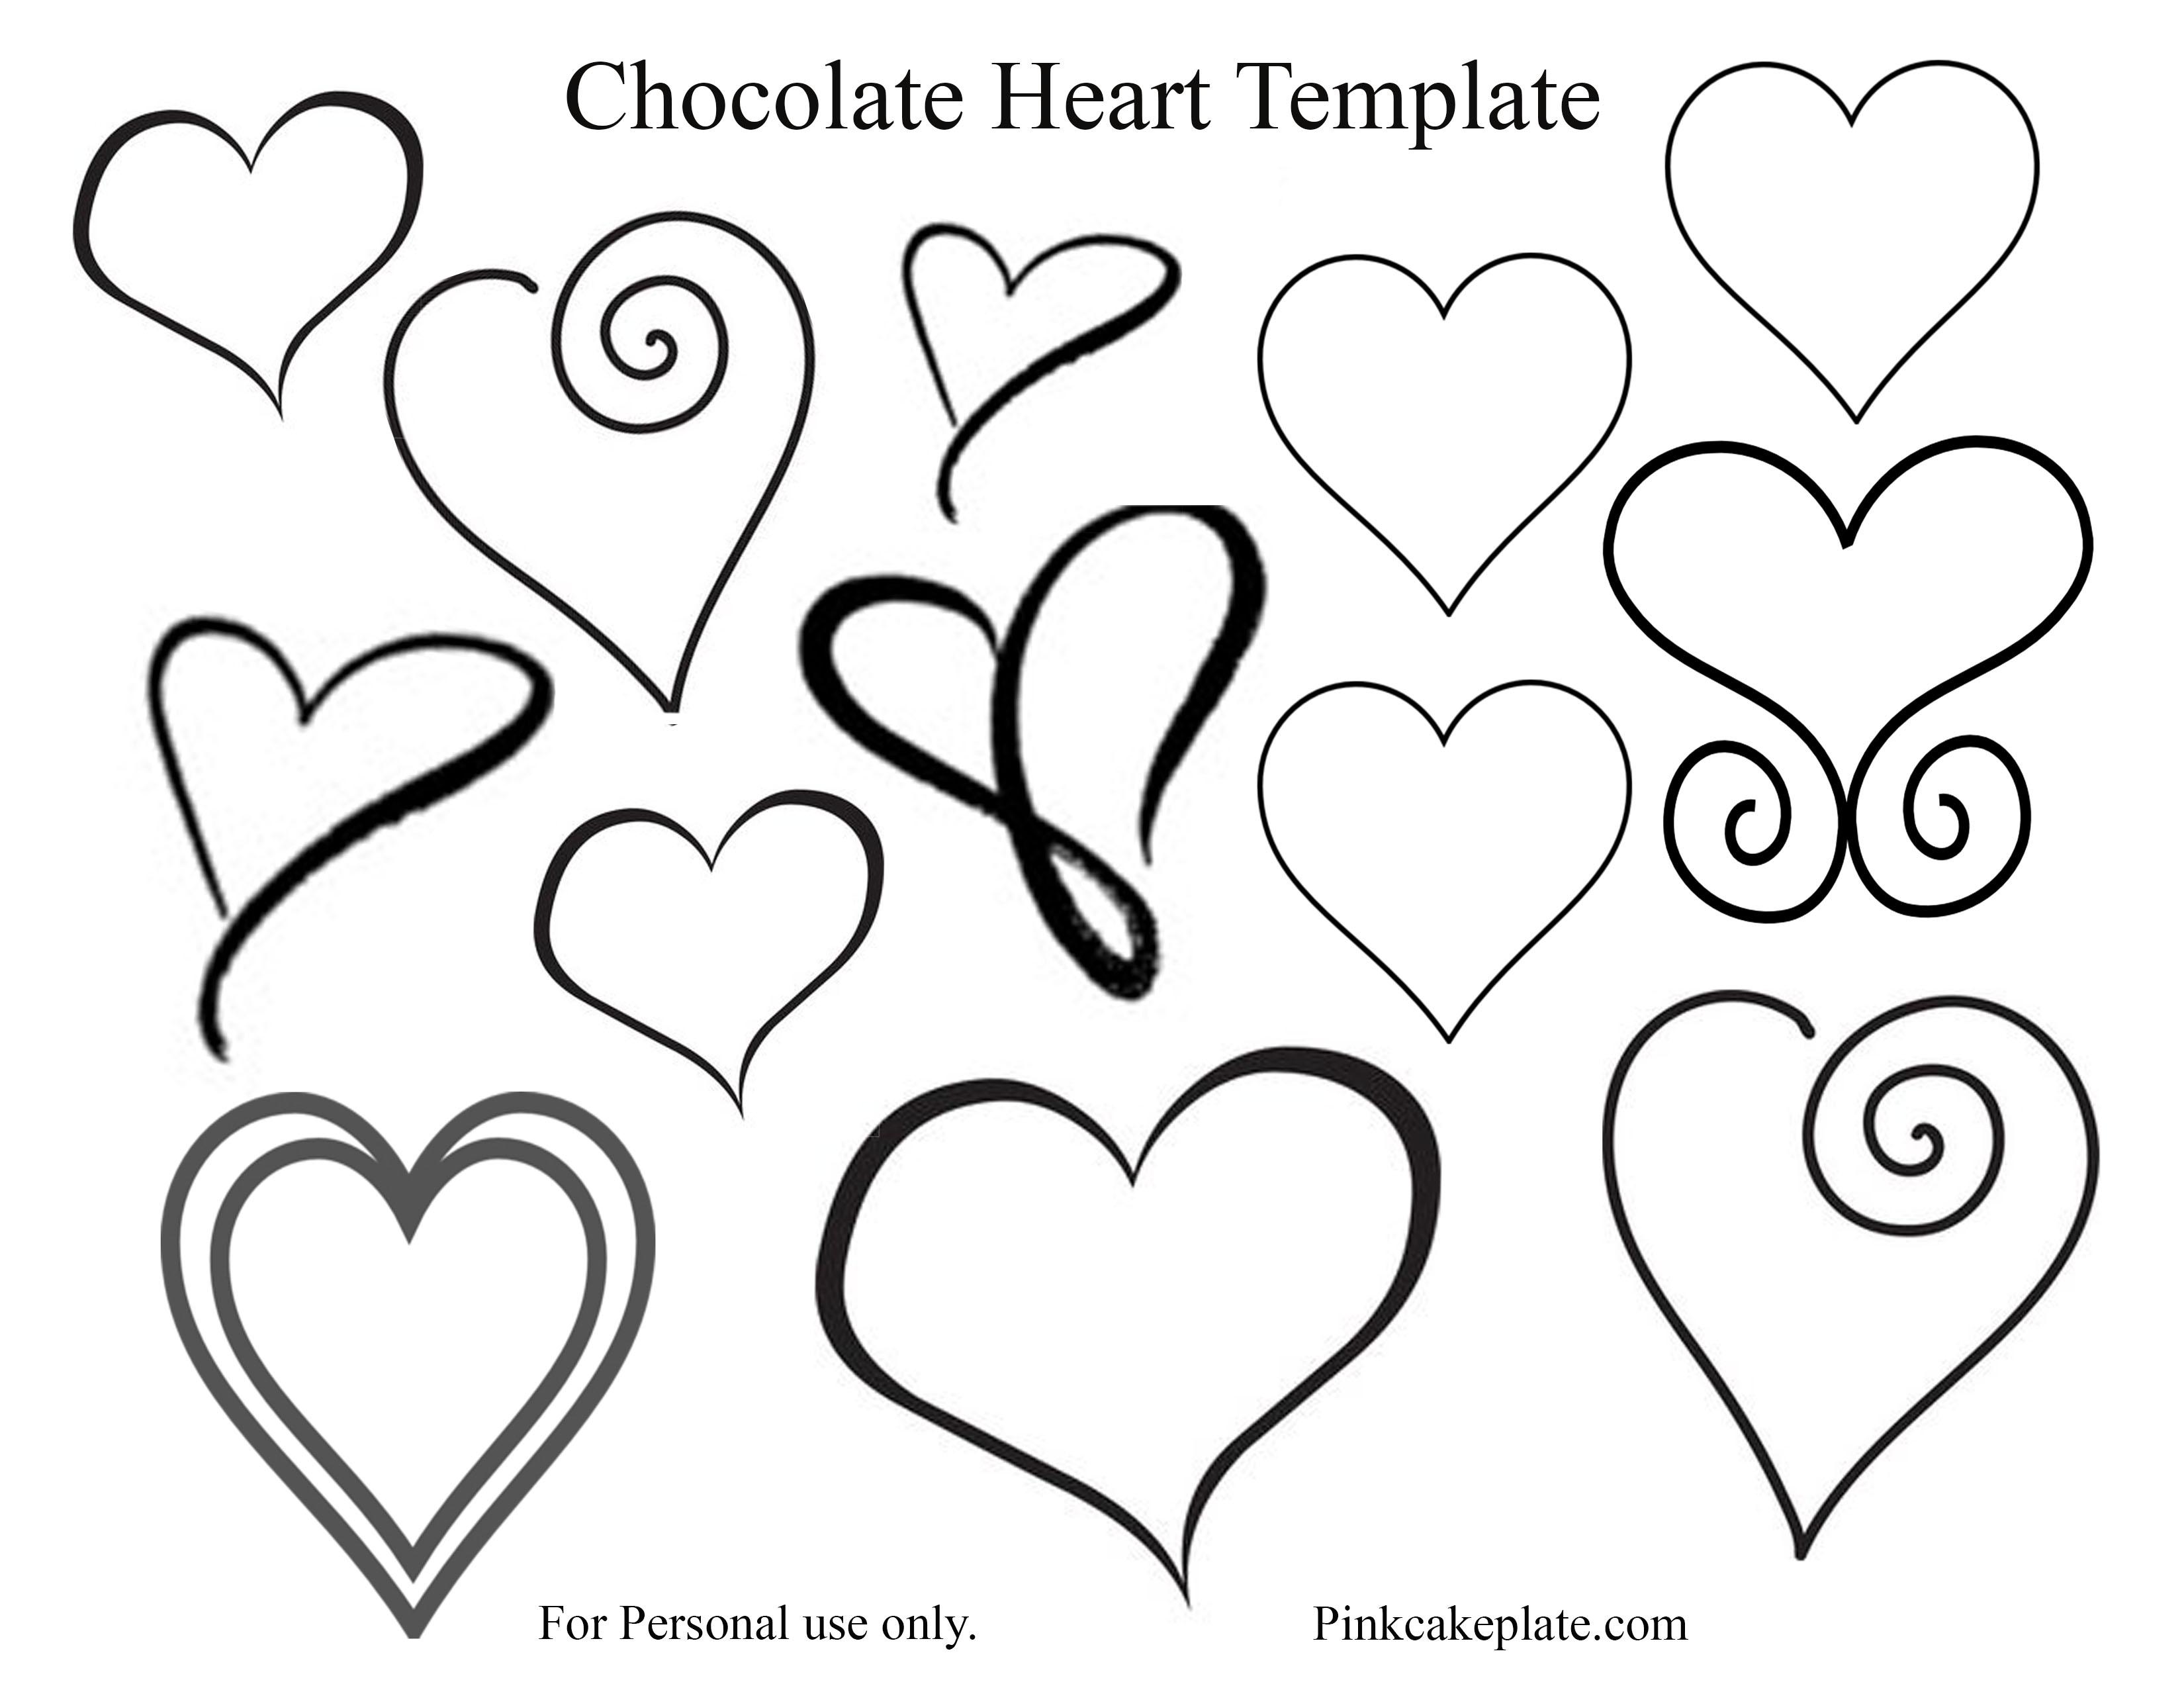 Chocolate Heart Template